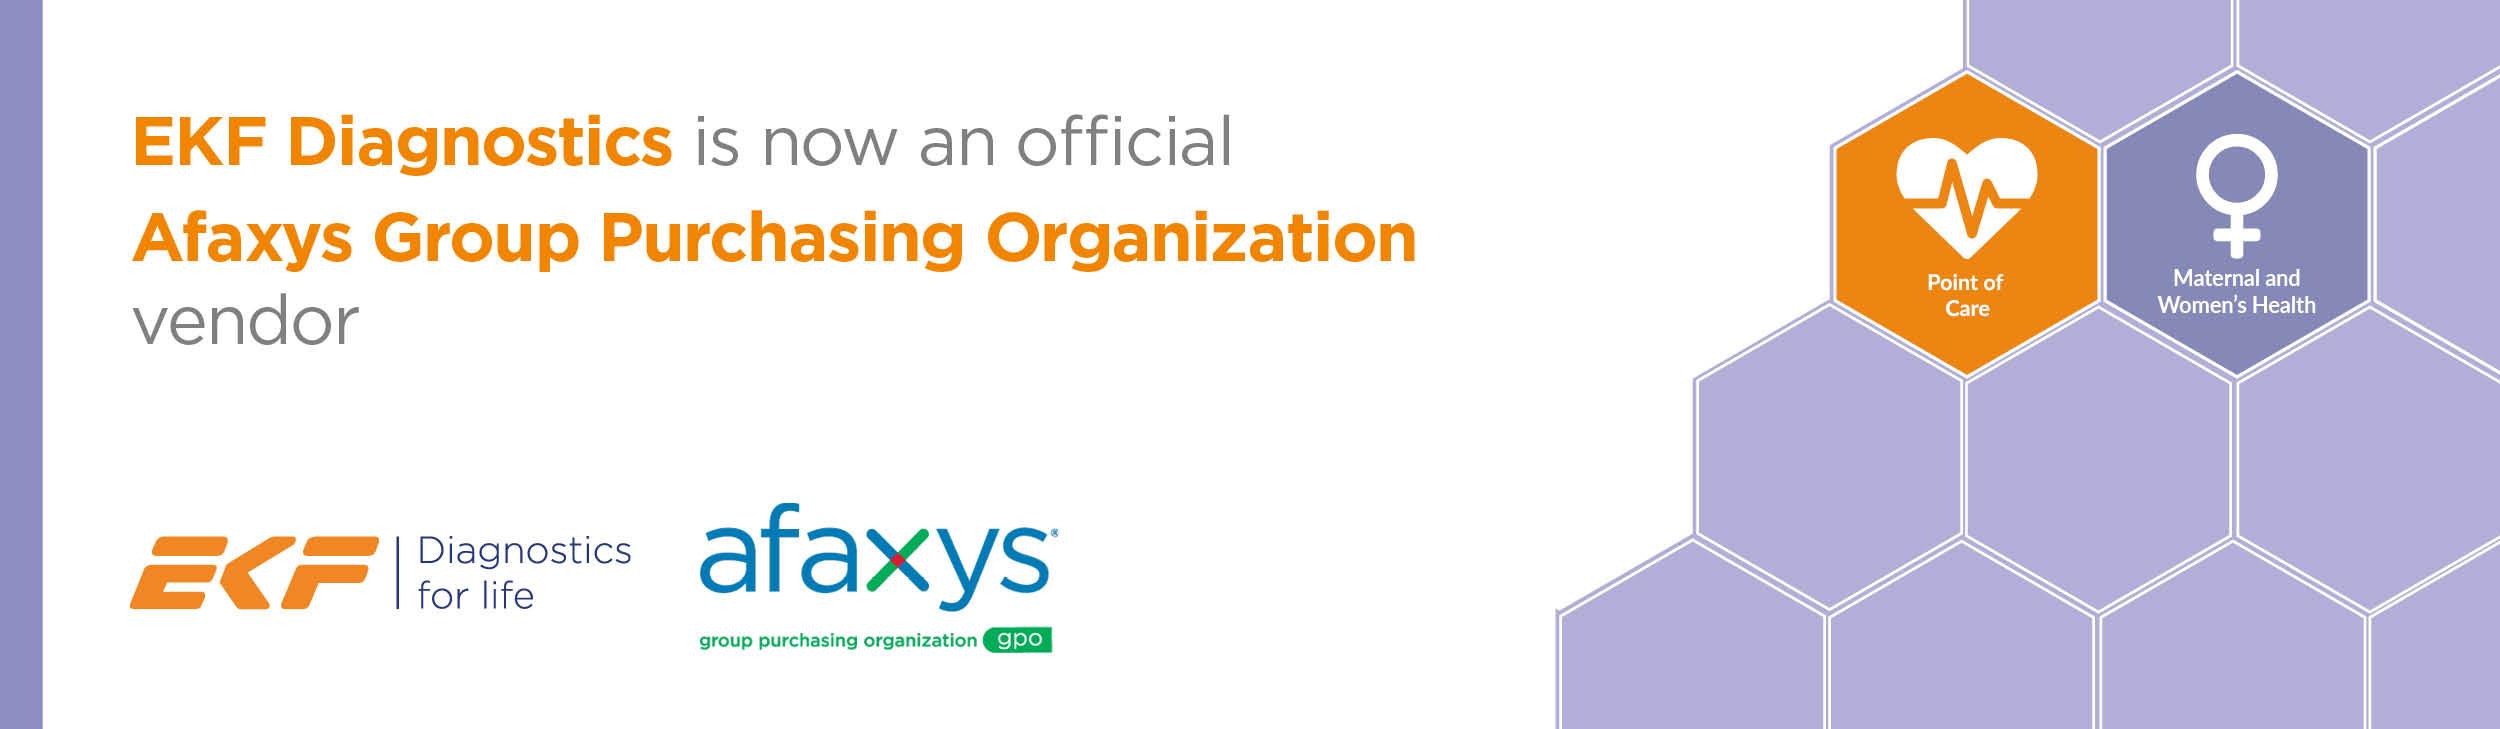 EKF-Afaxys-partnership-announcement-banner